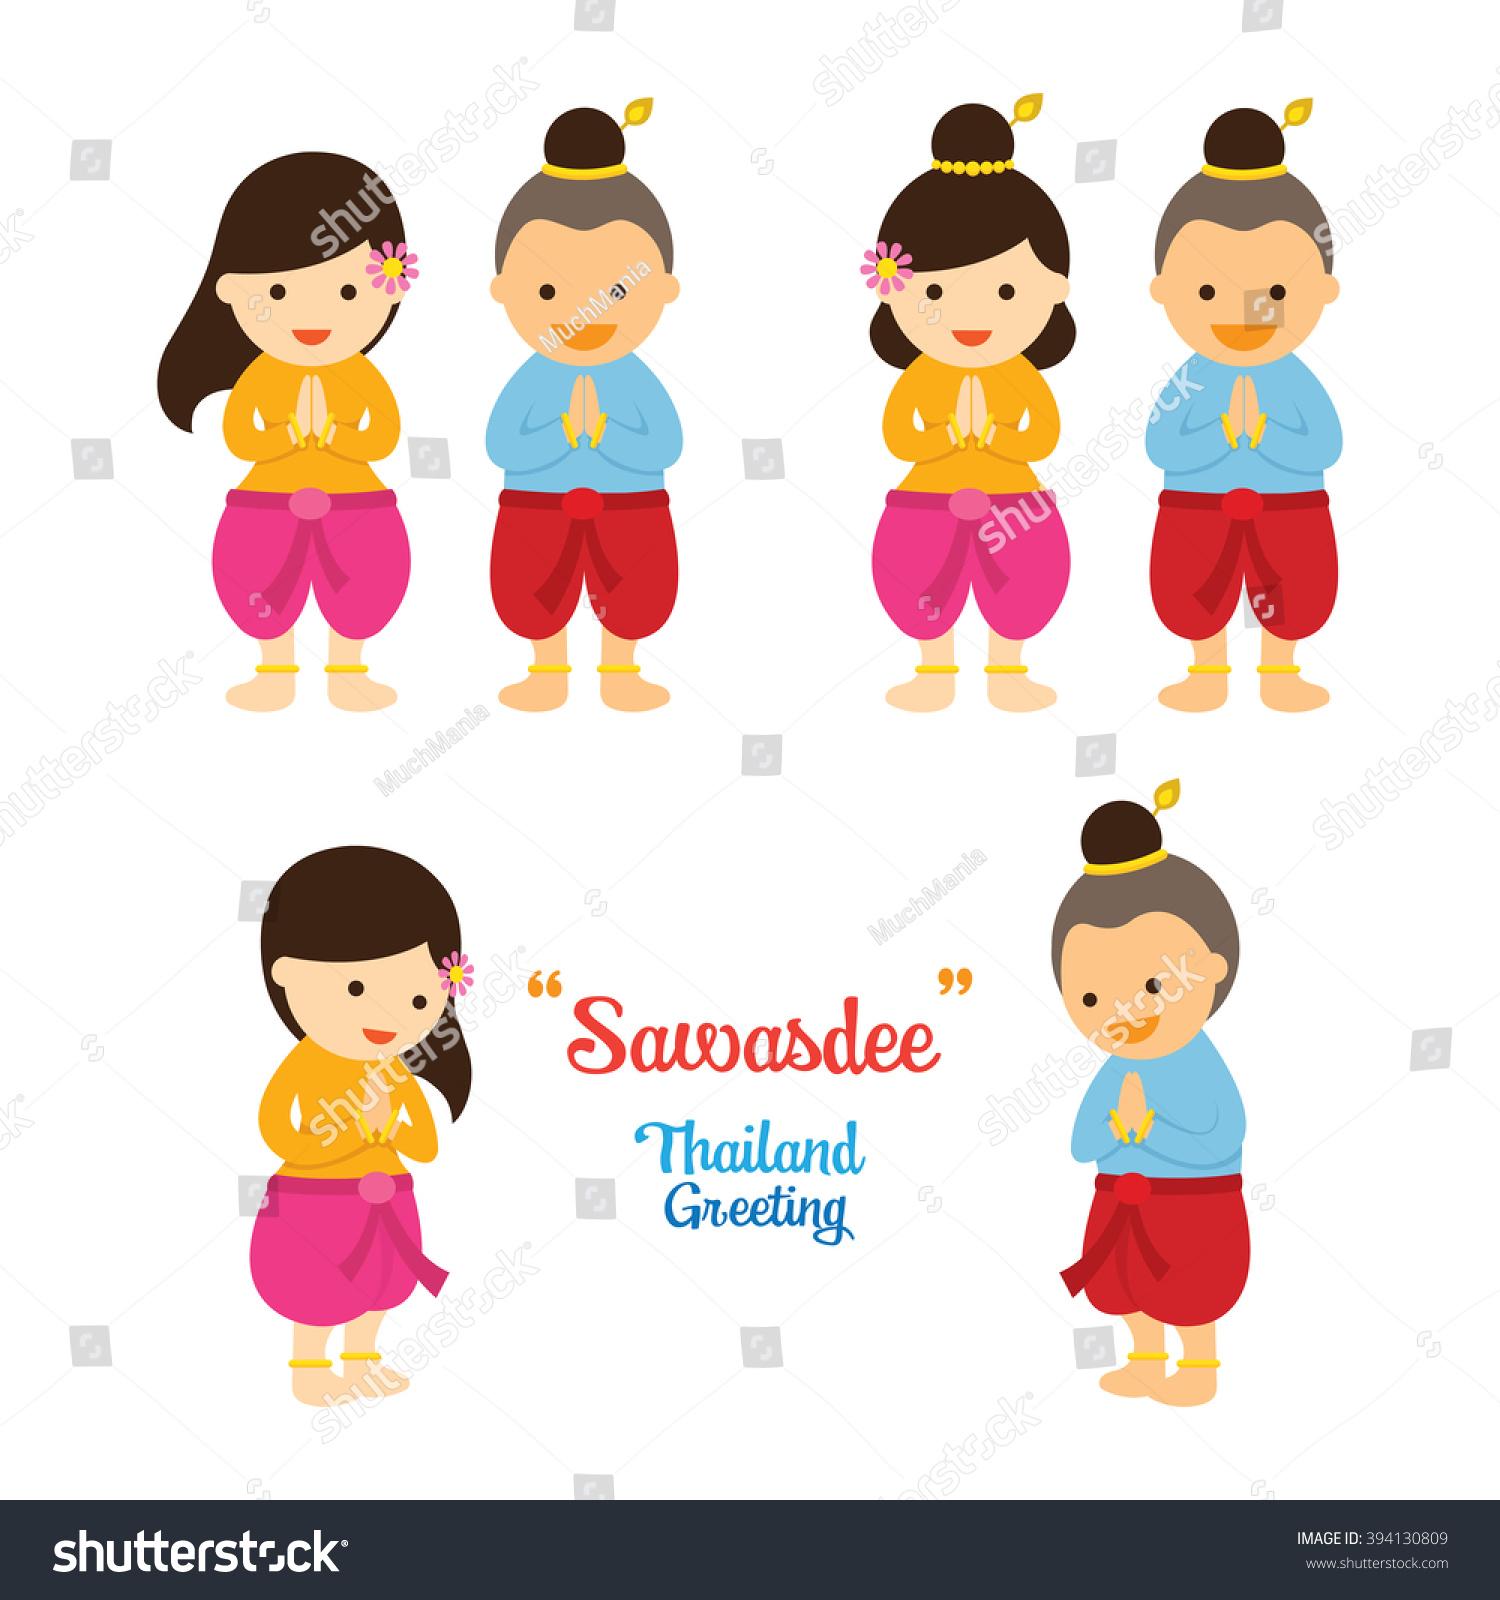 Sawasdee Kids Traditional Clothing Thailand Greeting Stock Vector